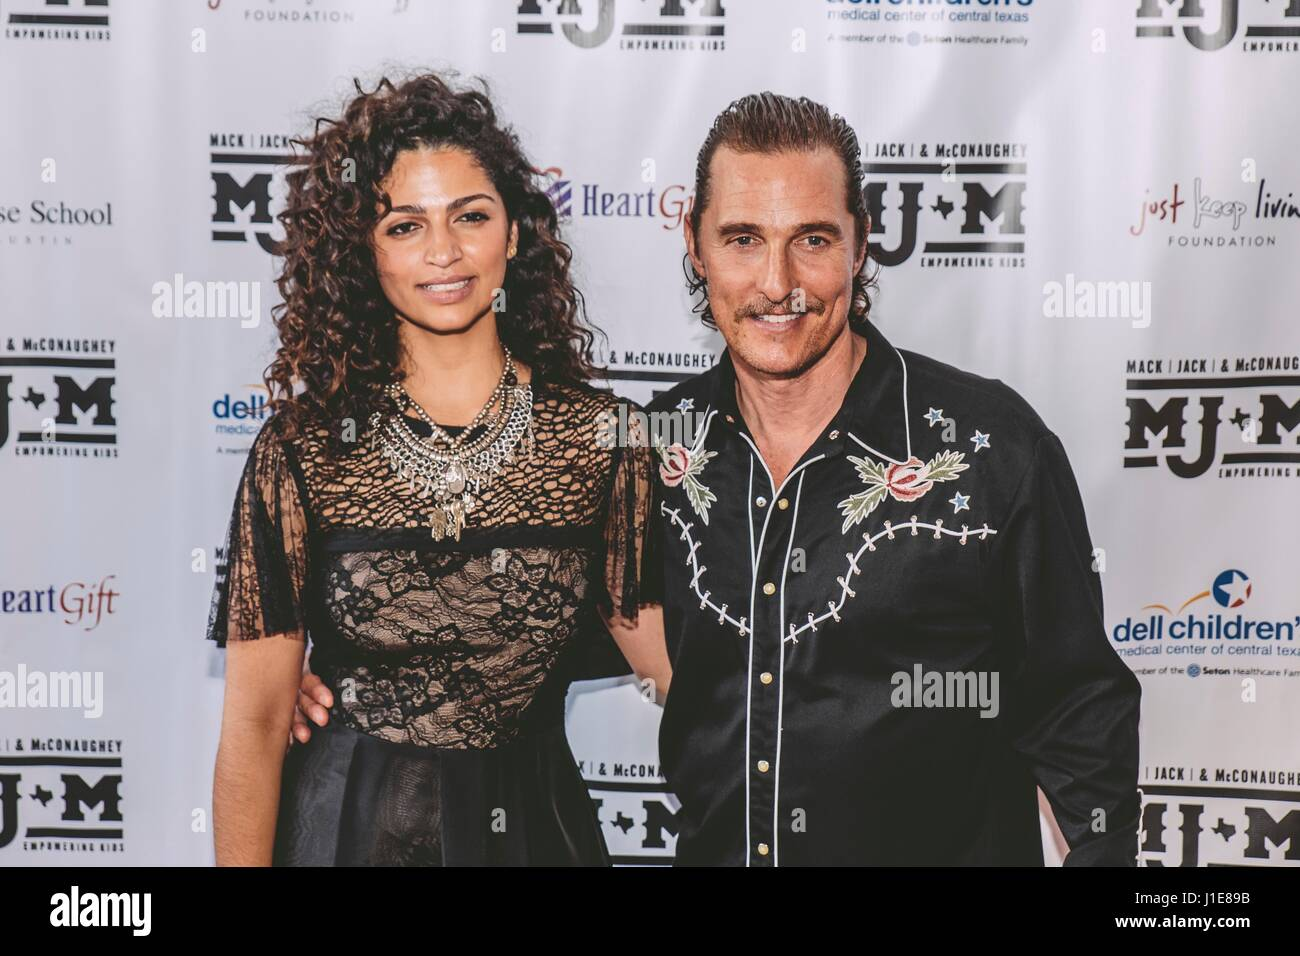 Austin, Stati Uniti d'America. Xx Apr, 2017. Camila Alves, Matthew McConaughey arrivano al 2017 Mack, Jack & Immagini Stock